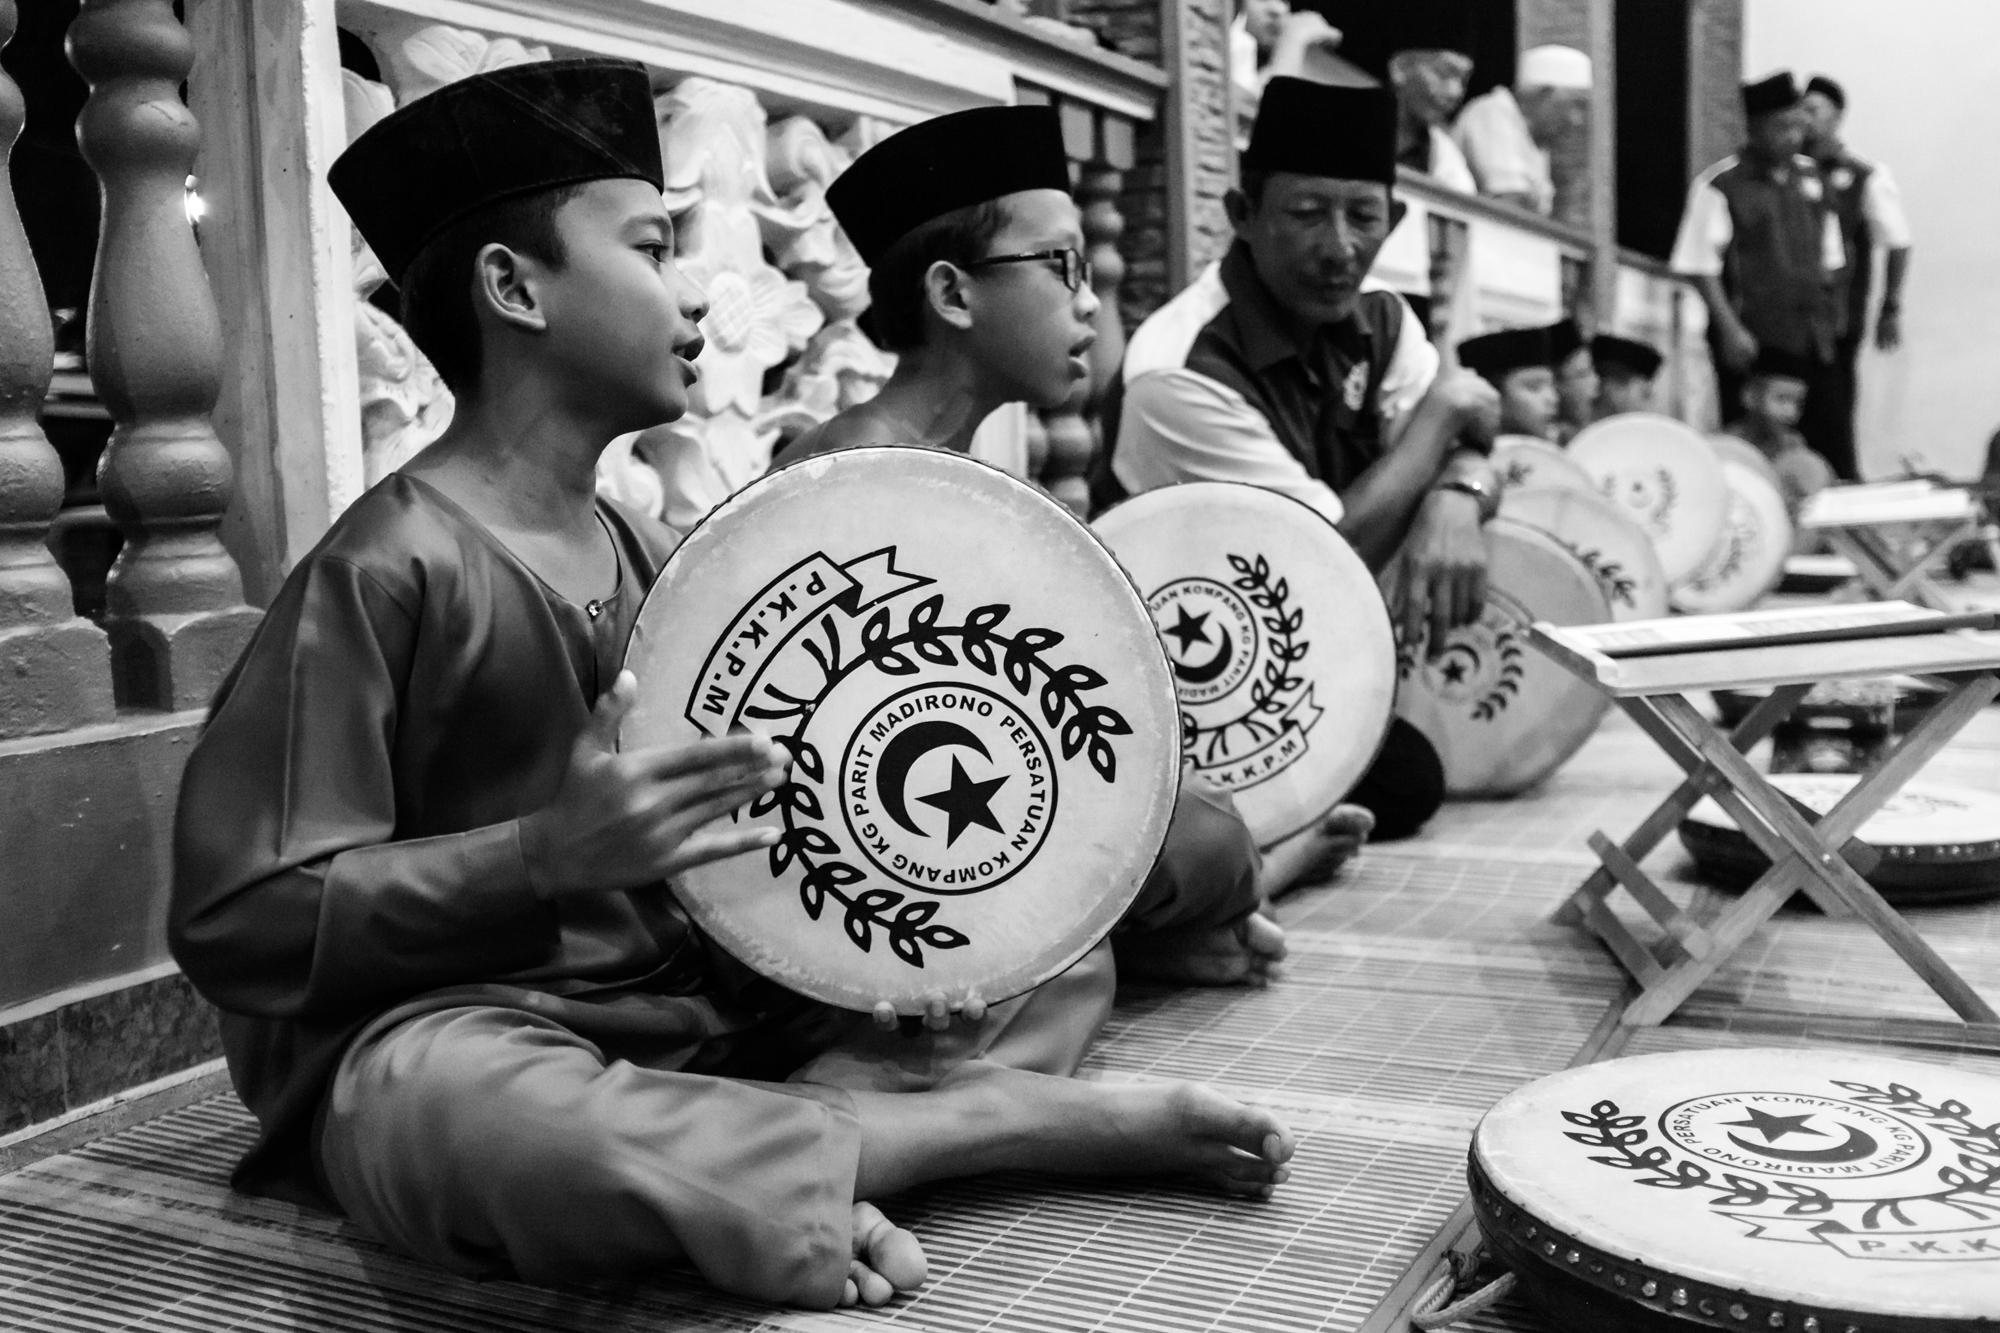 IRDA_Kompang Jidor HIGHRES_CJH-0717.jpg